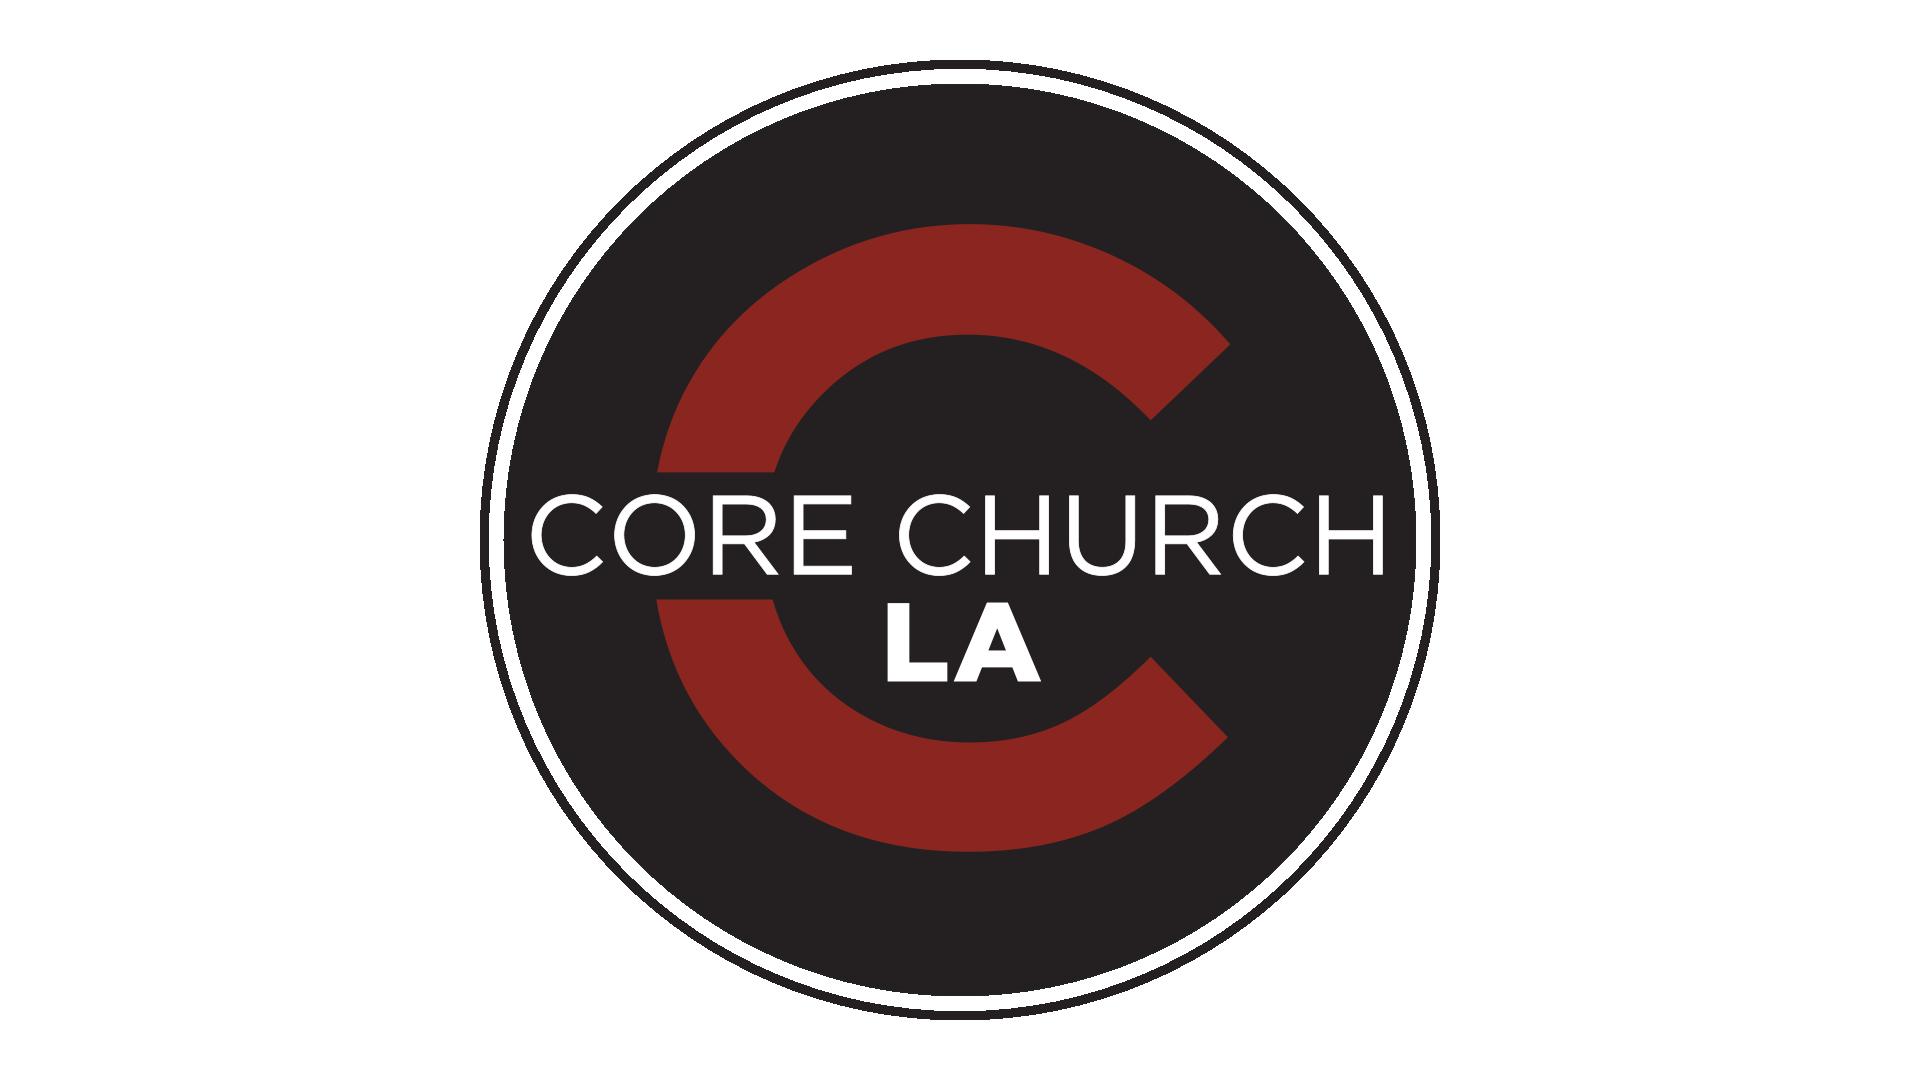 Info@CoreChurchLA.com